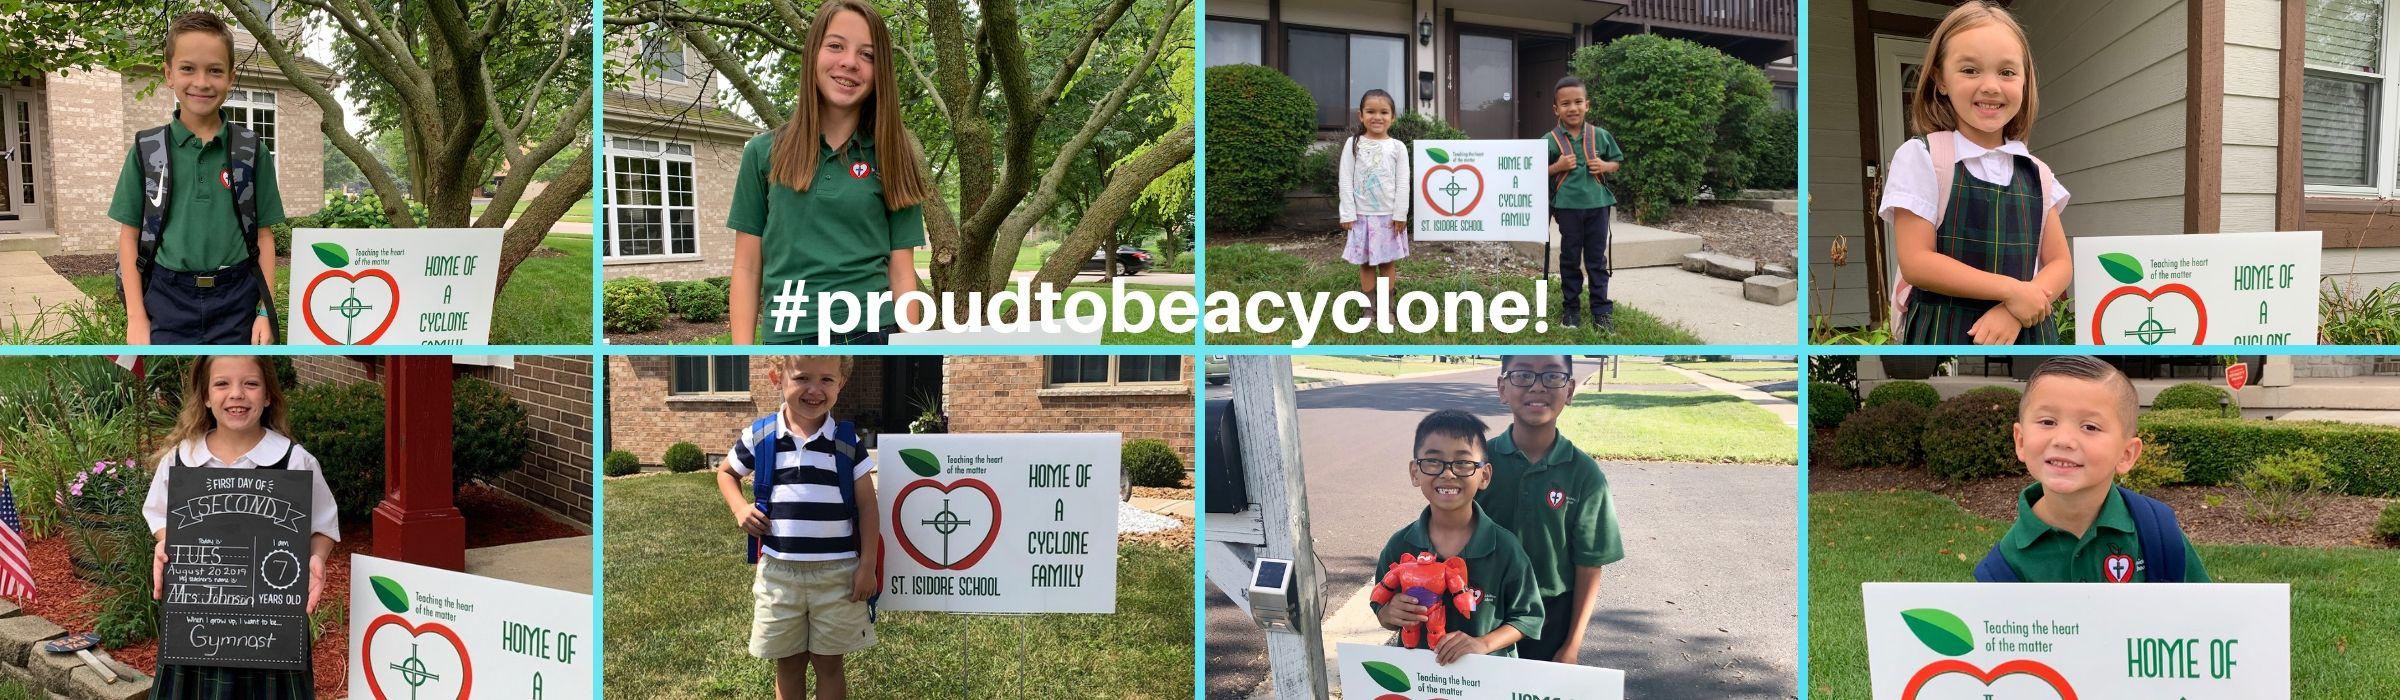 #proudtobeacyclone!g